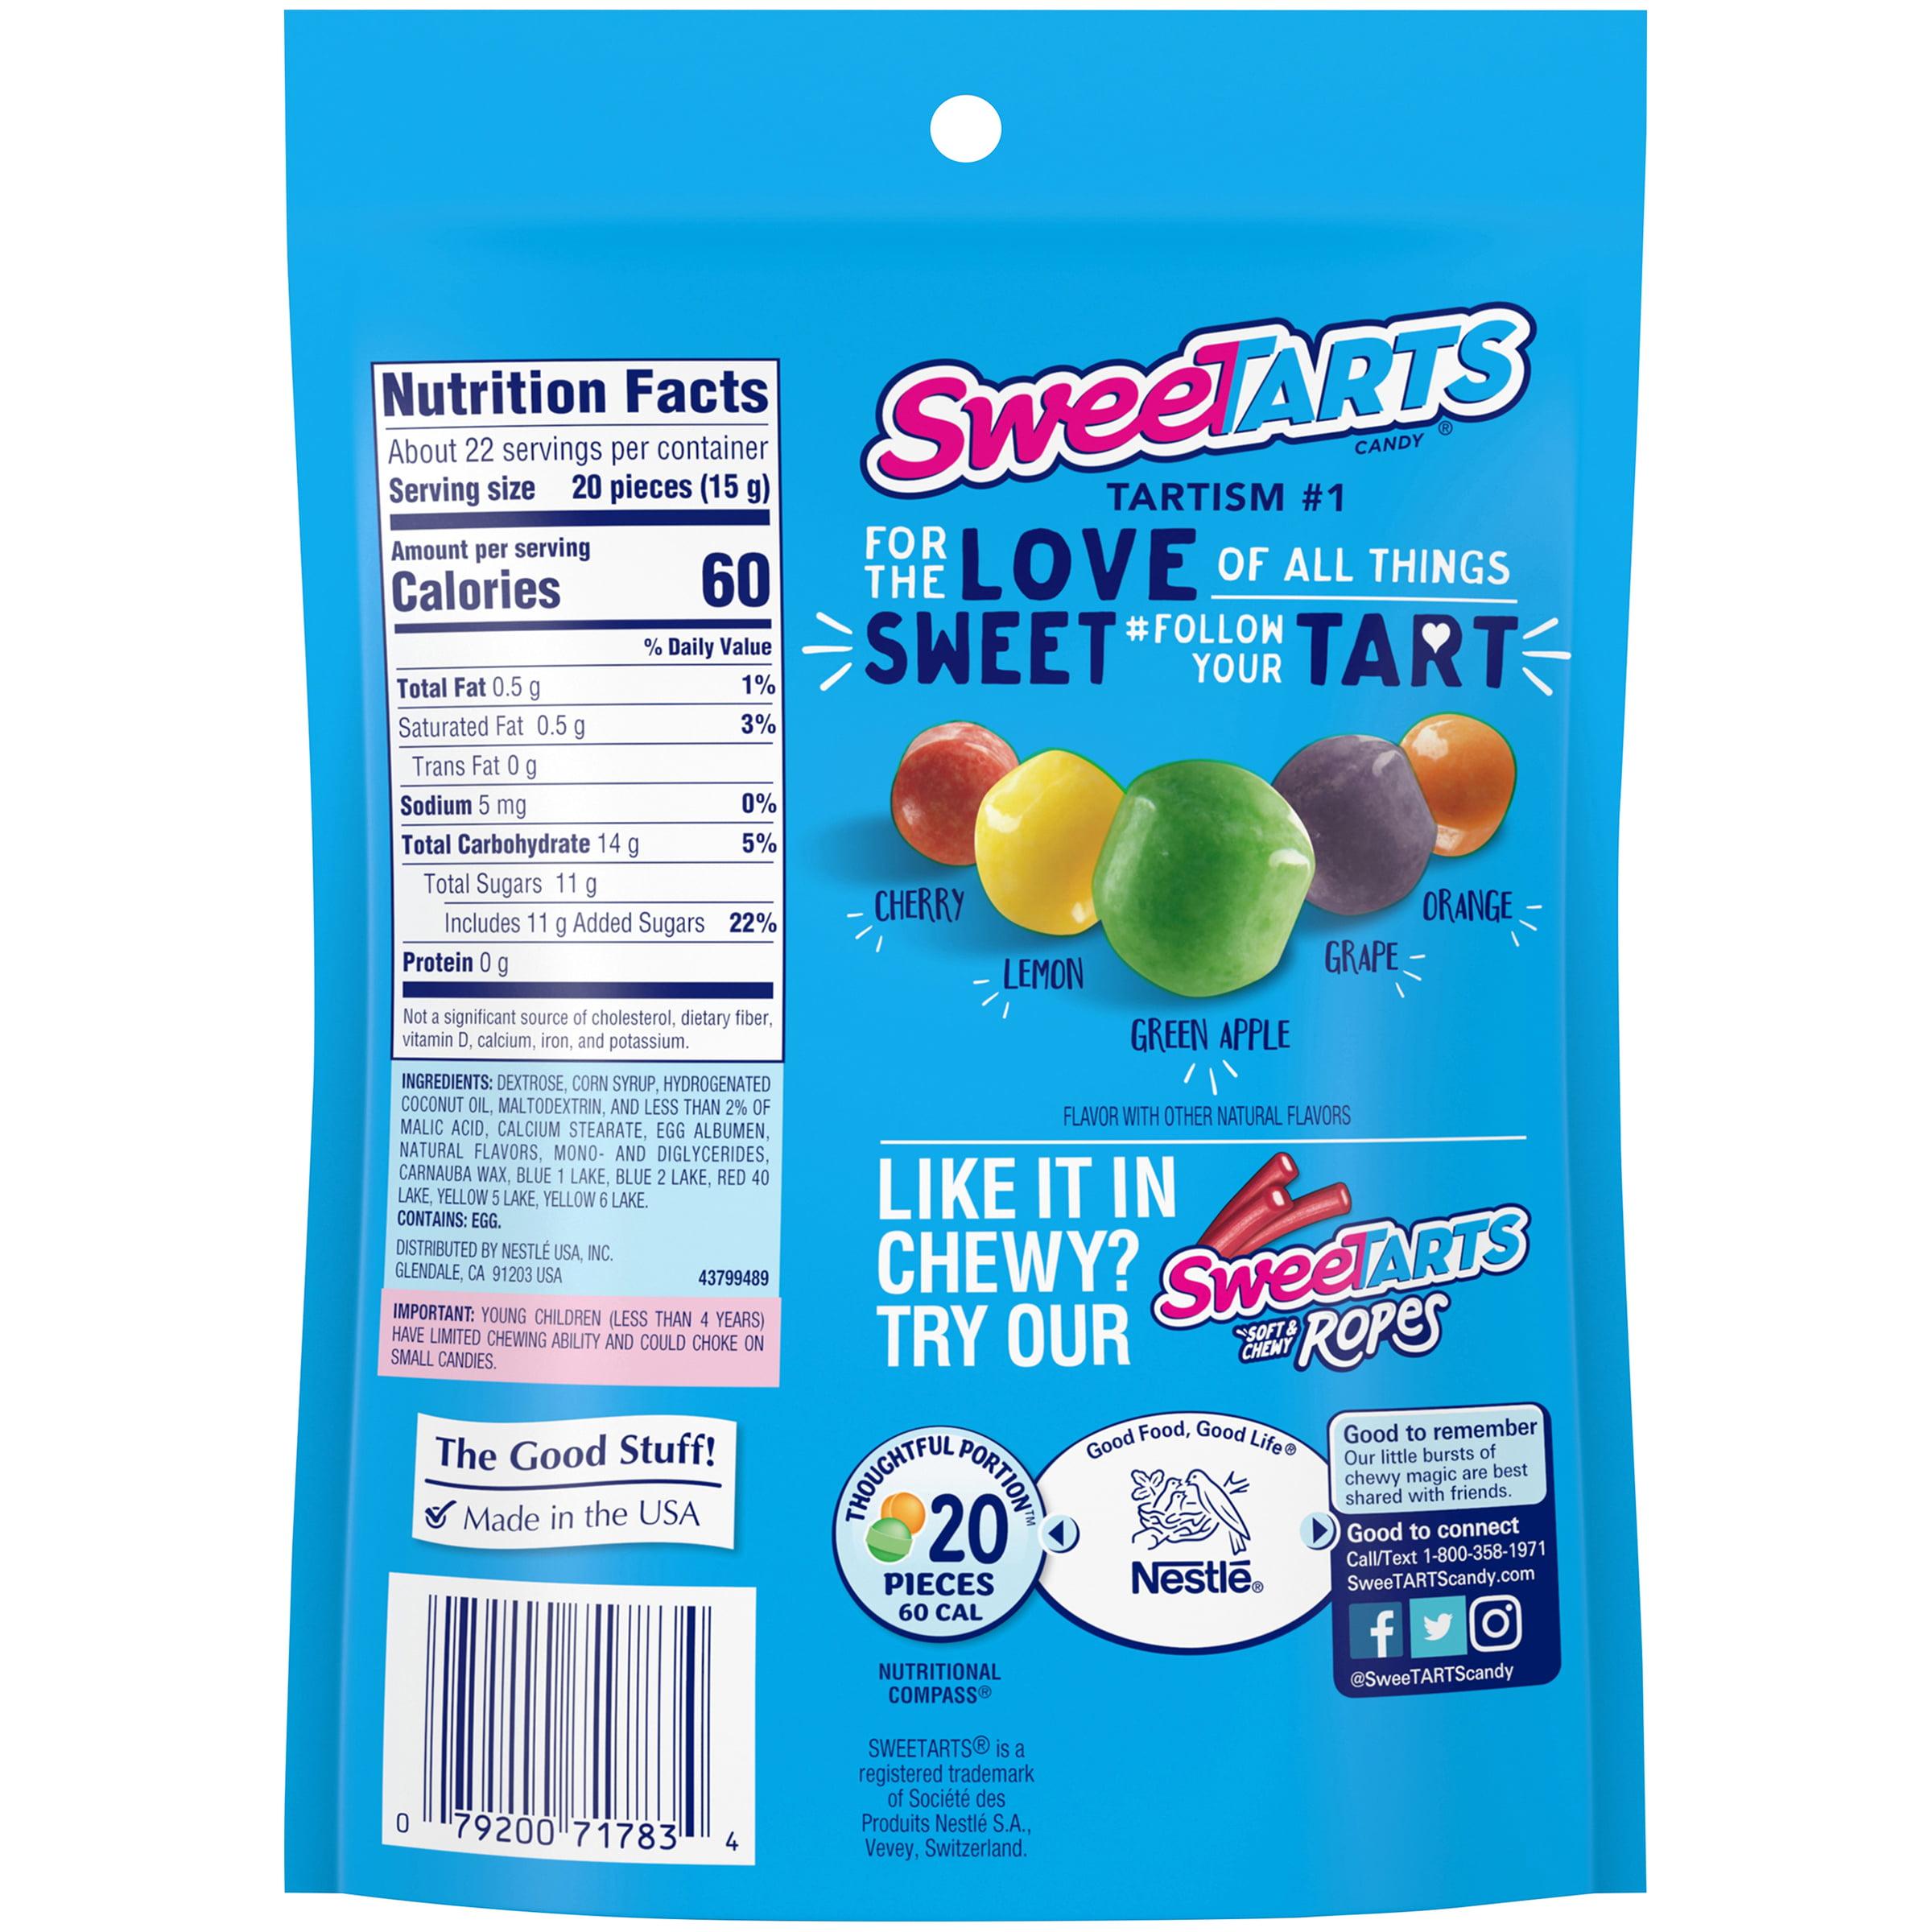 SweeTARTS Mini Chewy Candy 12 oz. Stand-Up Bag - Walmart.com